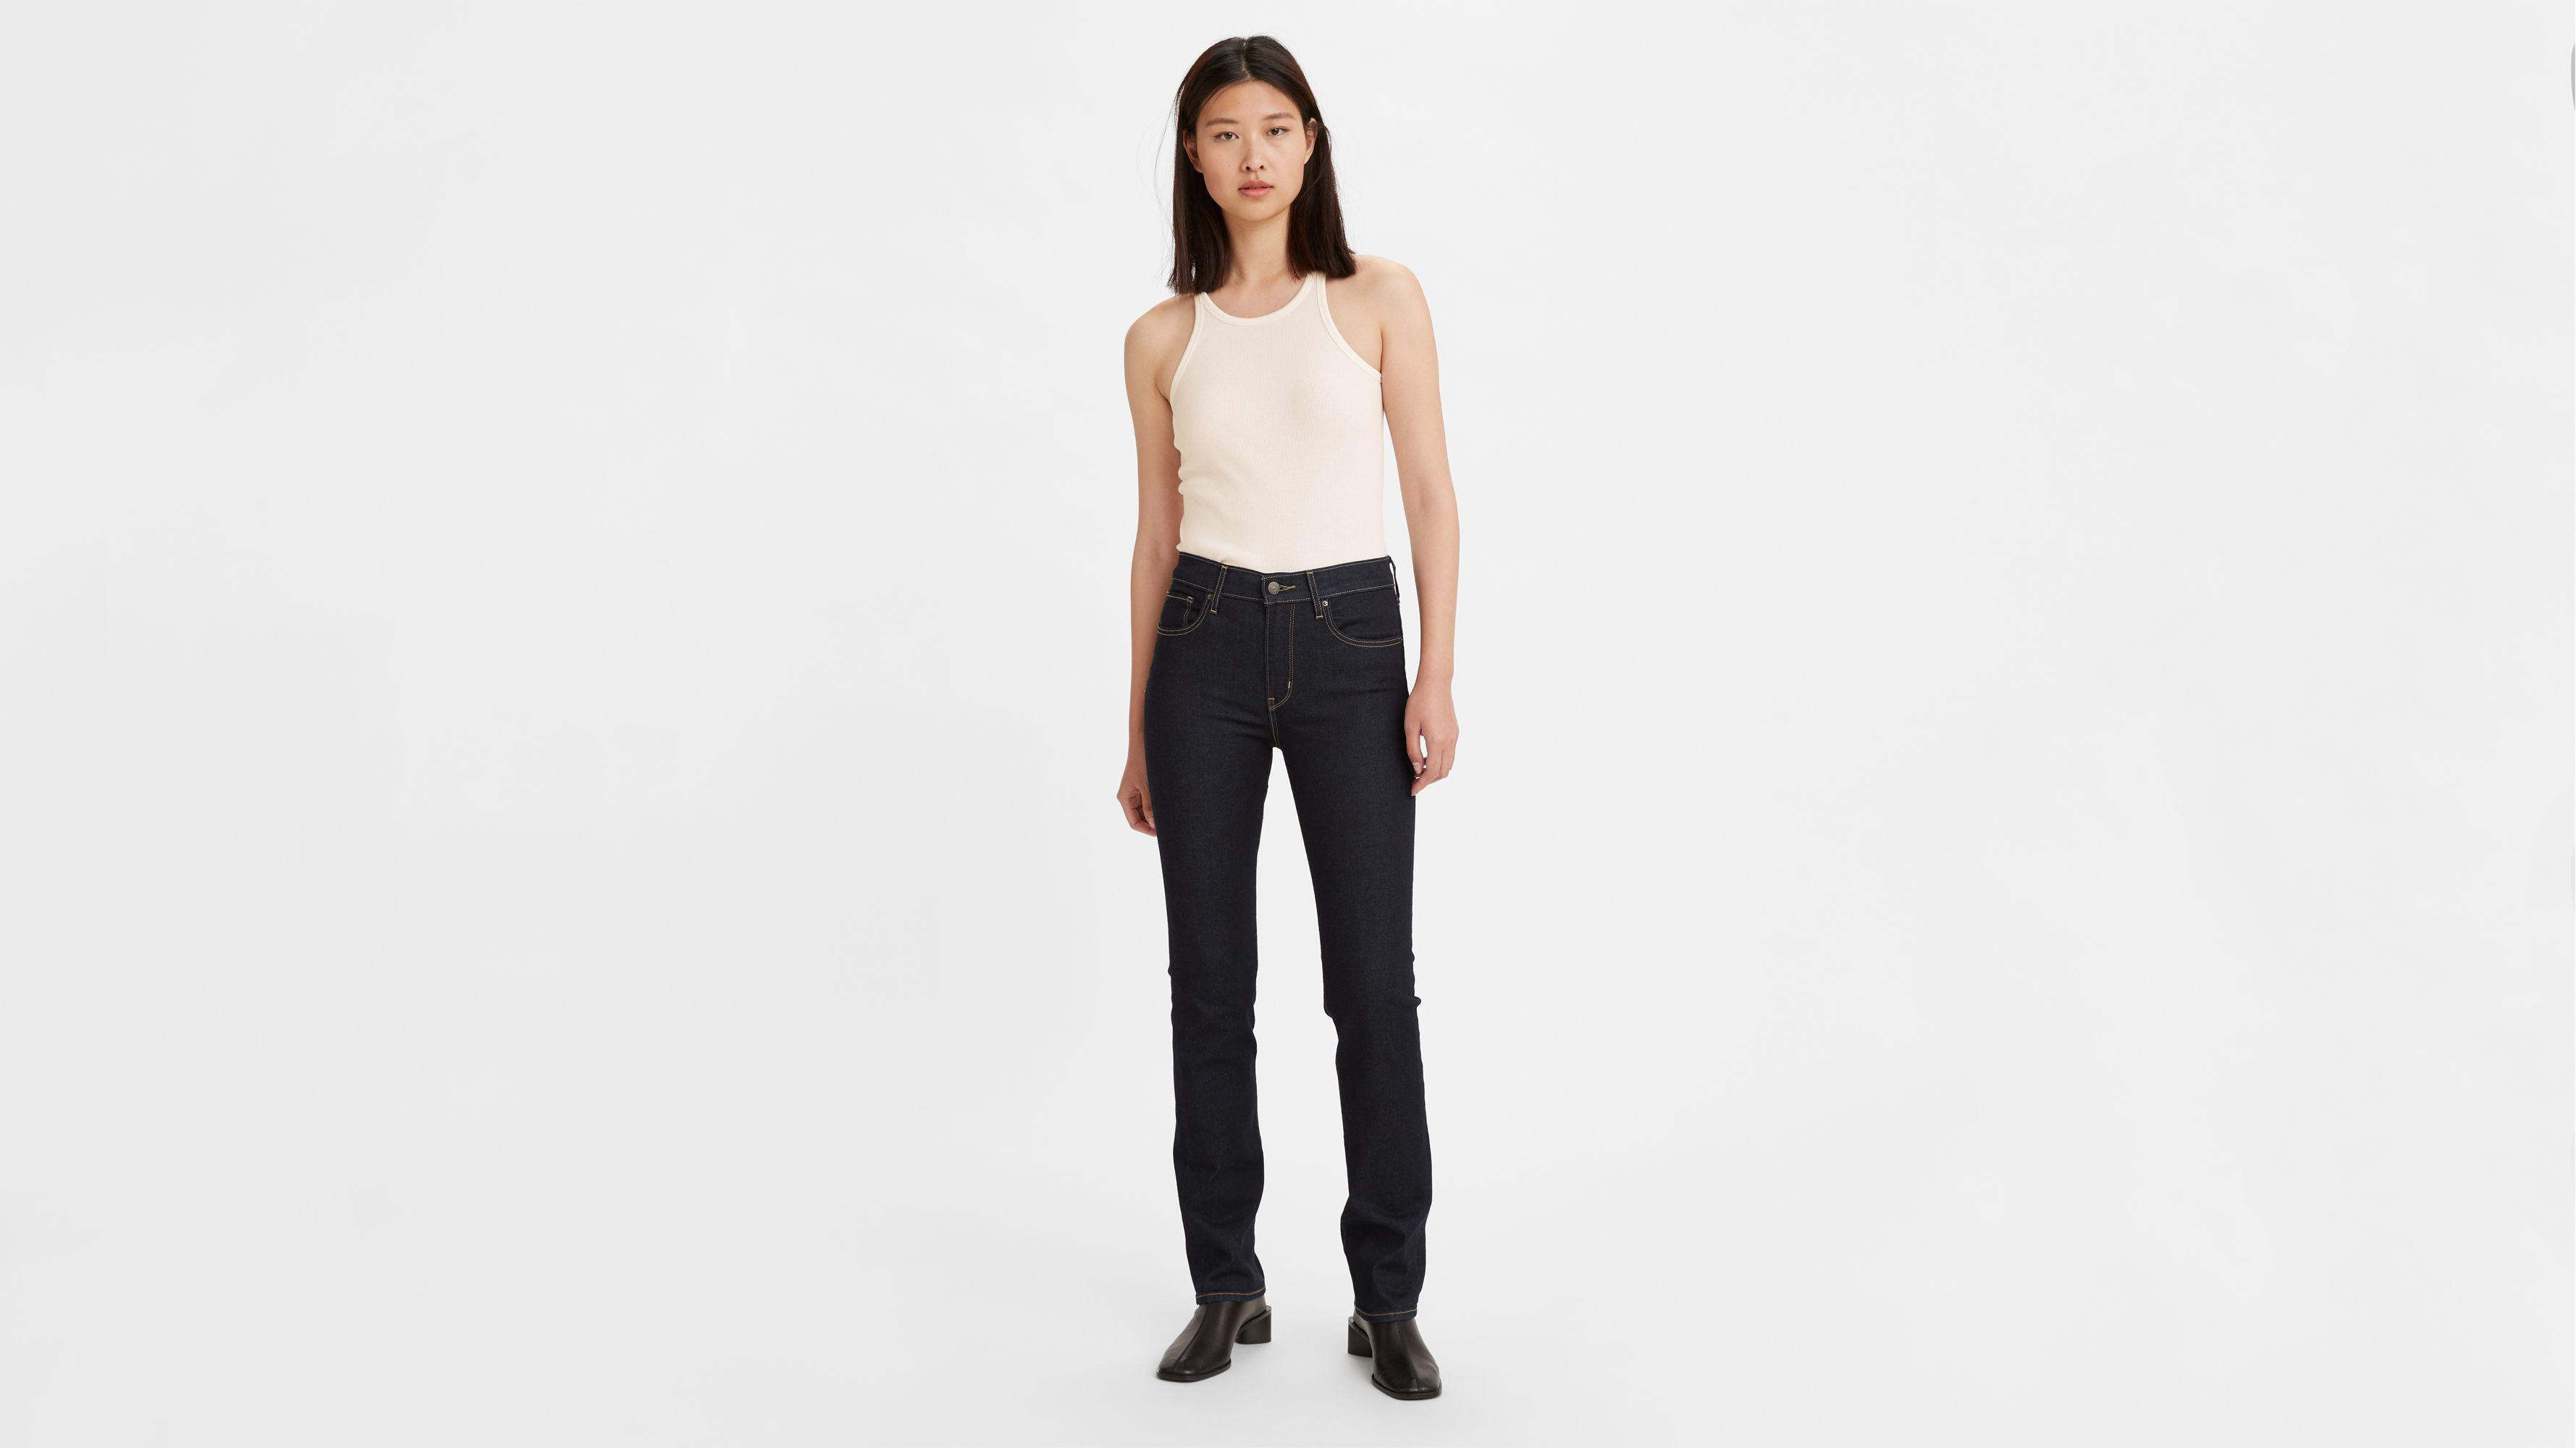 724™ High waisted Straight Jeans Blue | Levi's® FR